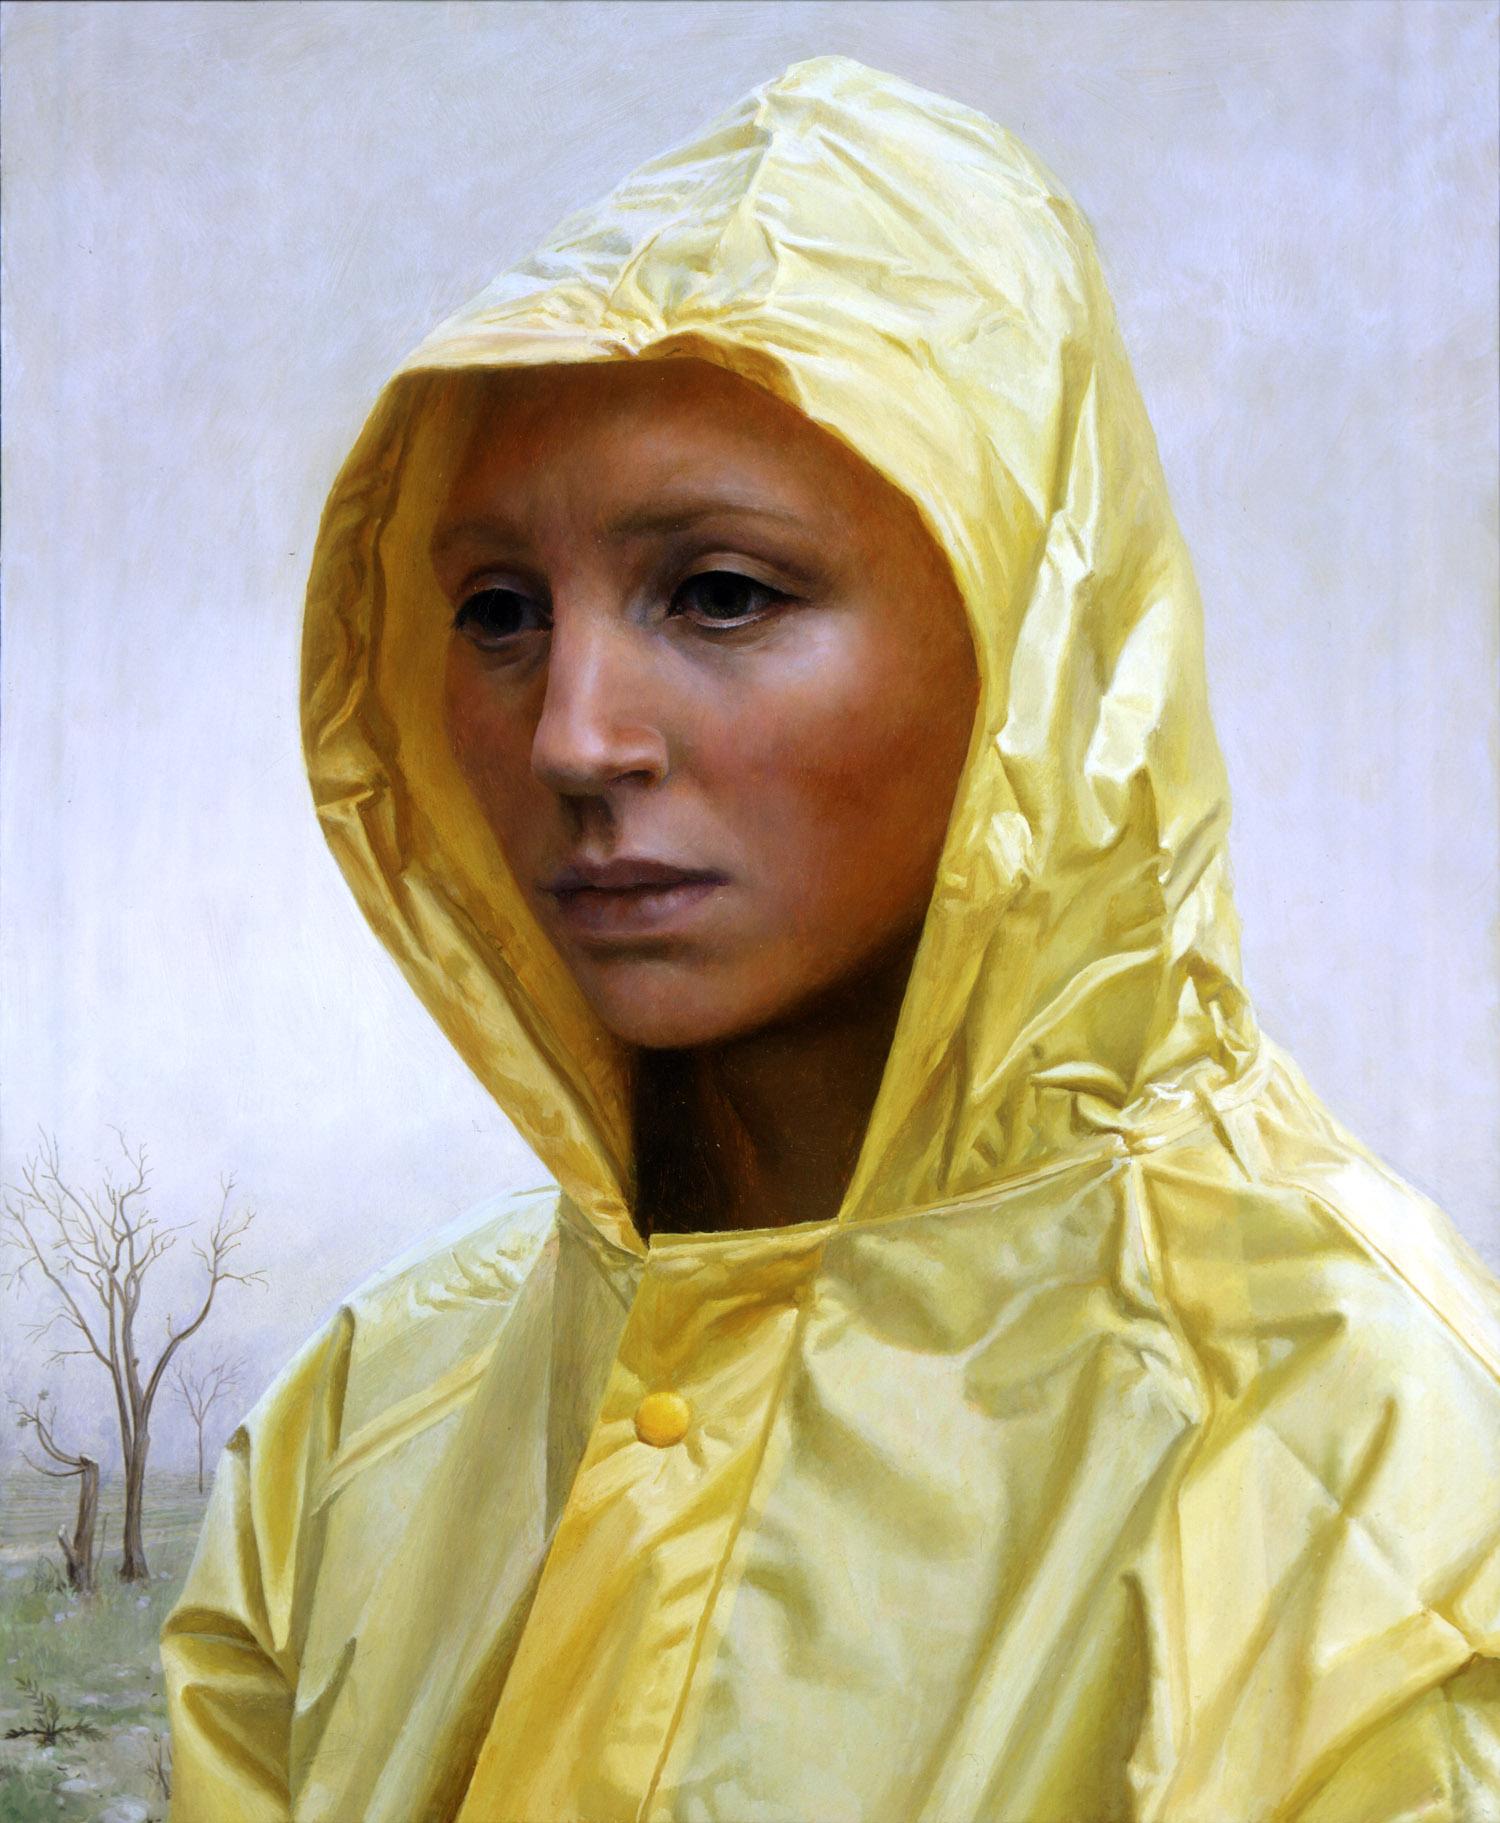 Raincoat , oil on panel, 23 x 19 in, 2002